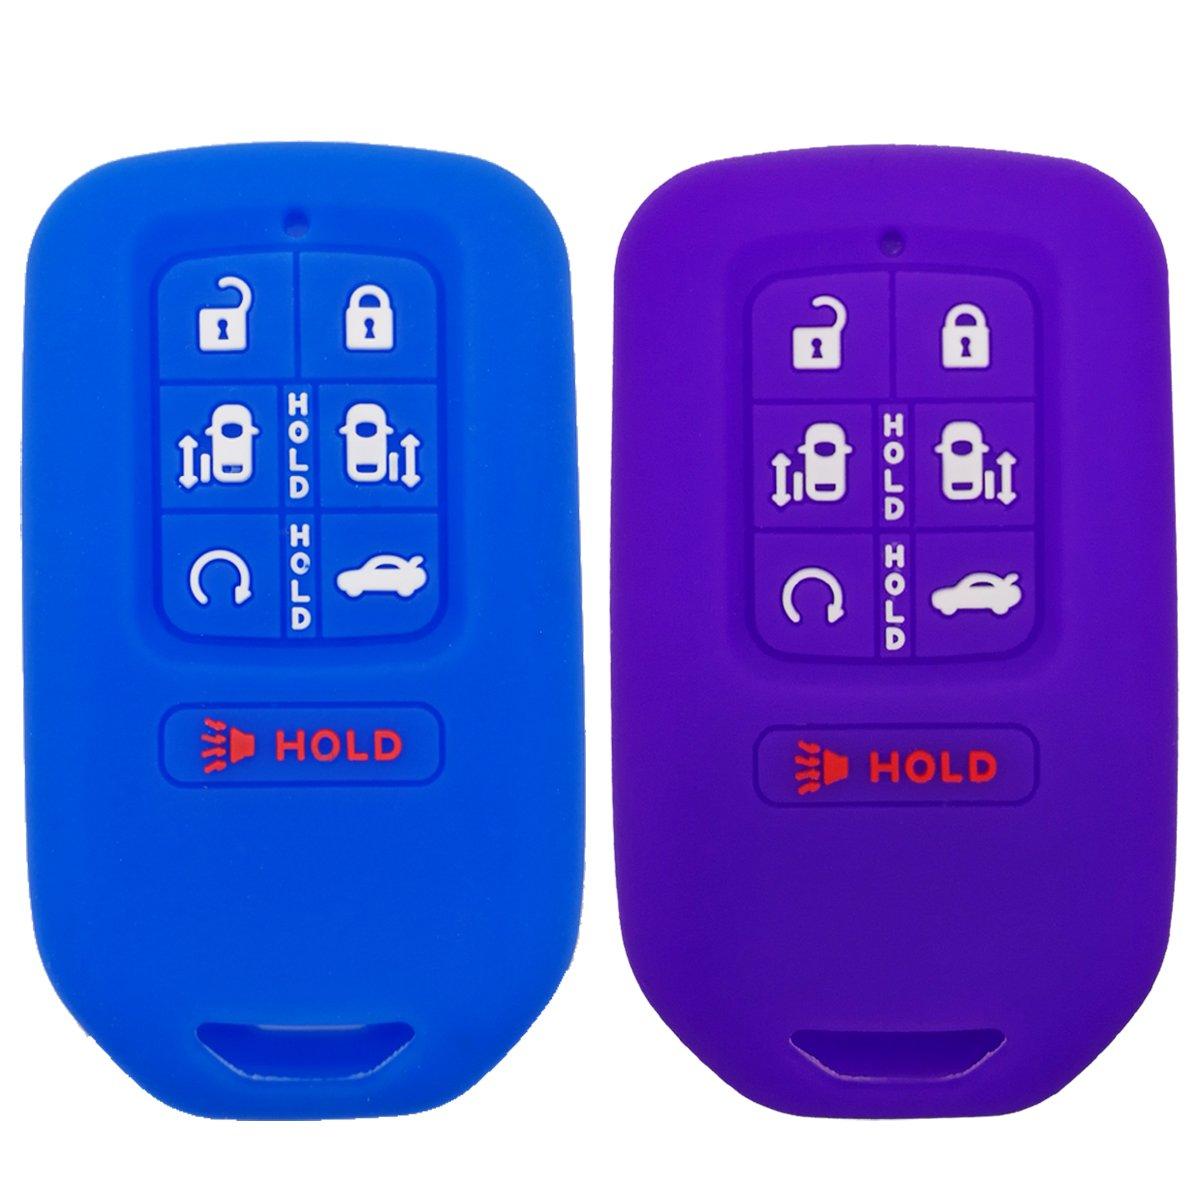 2Pcs Coolbestda Smart Key Fob Cover Skin Remote Case Keyless Entry Jacket Shell for 2020 2019 2018 Honda Odyssey elite ex